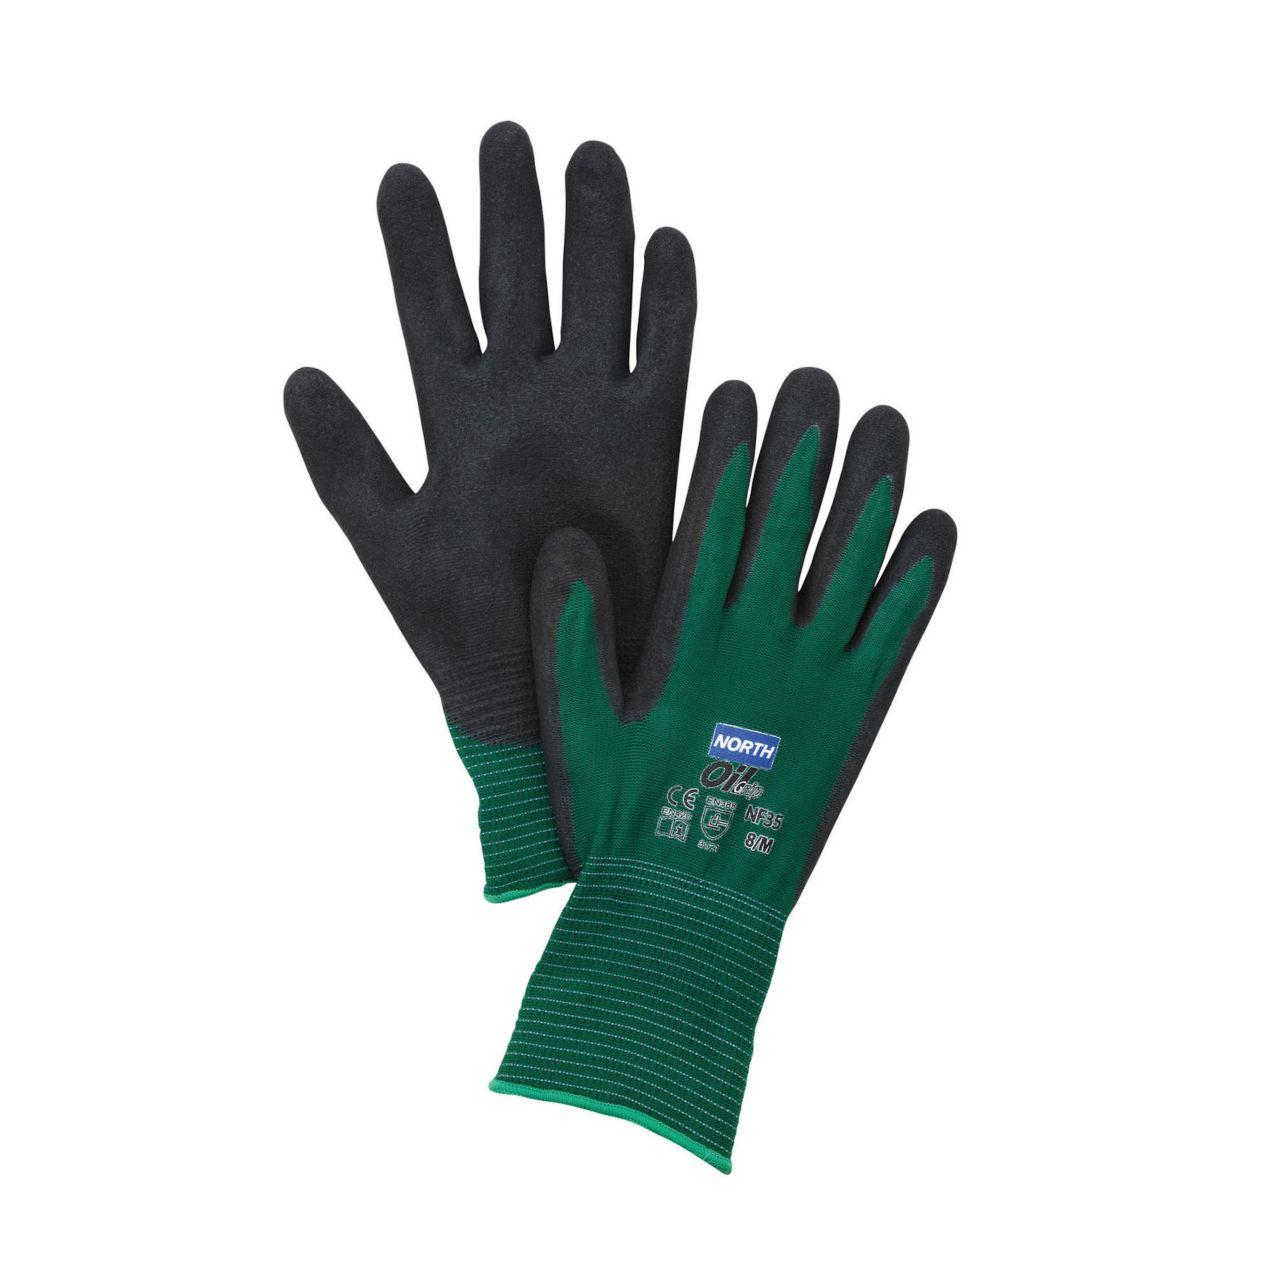 NorthFlex Oil Grip™ NF35 Foam Nitrile 2-Stage Palm Coated Gloves, Green/Black